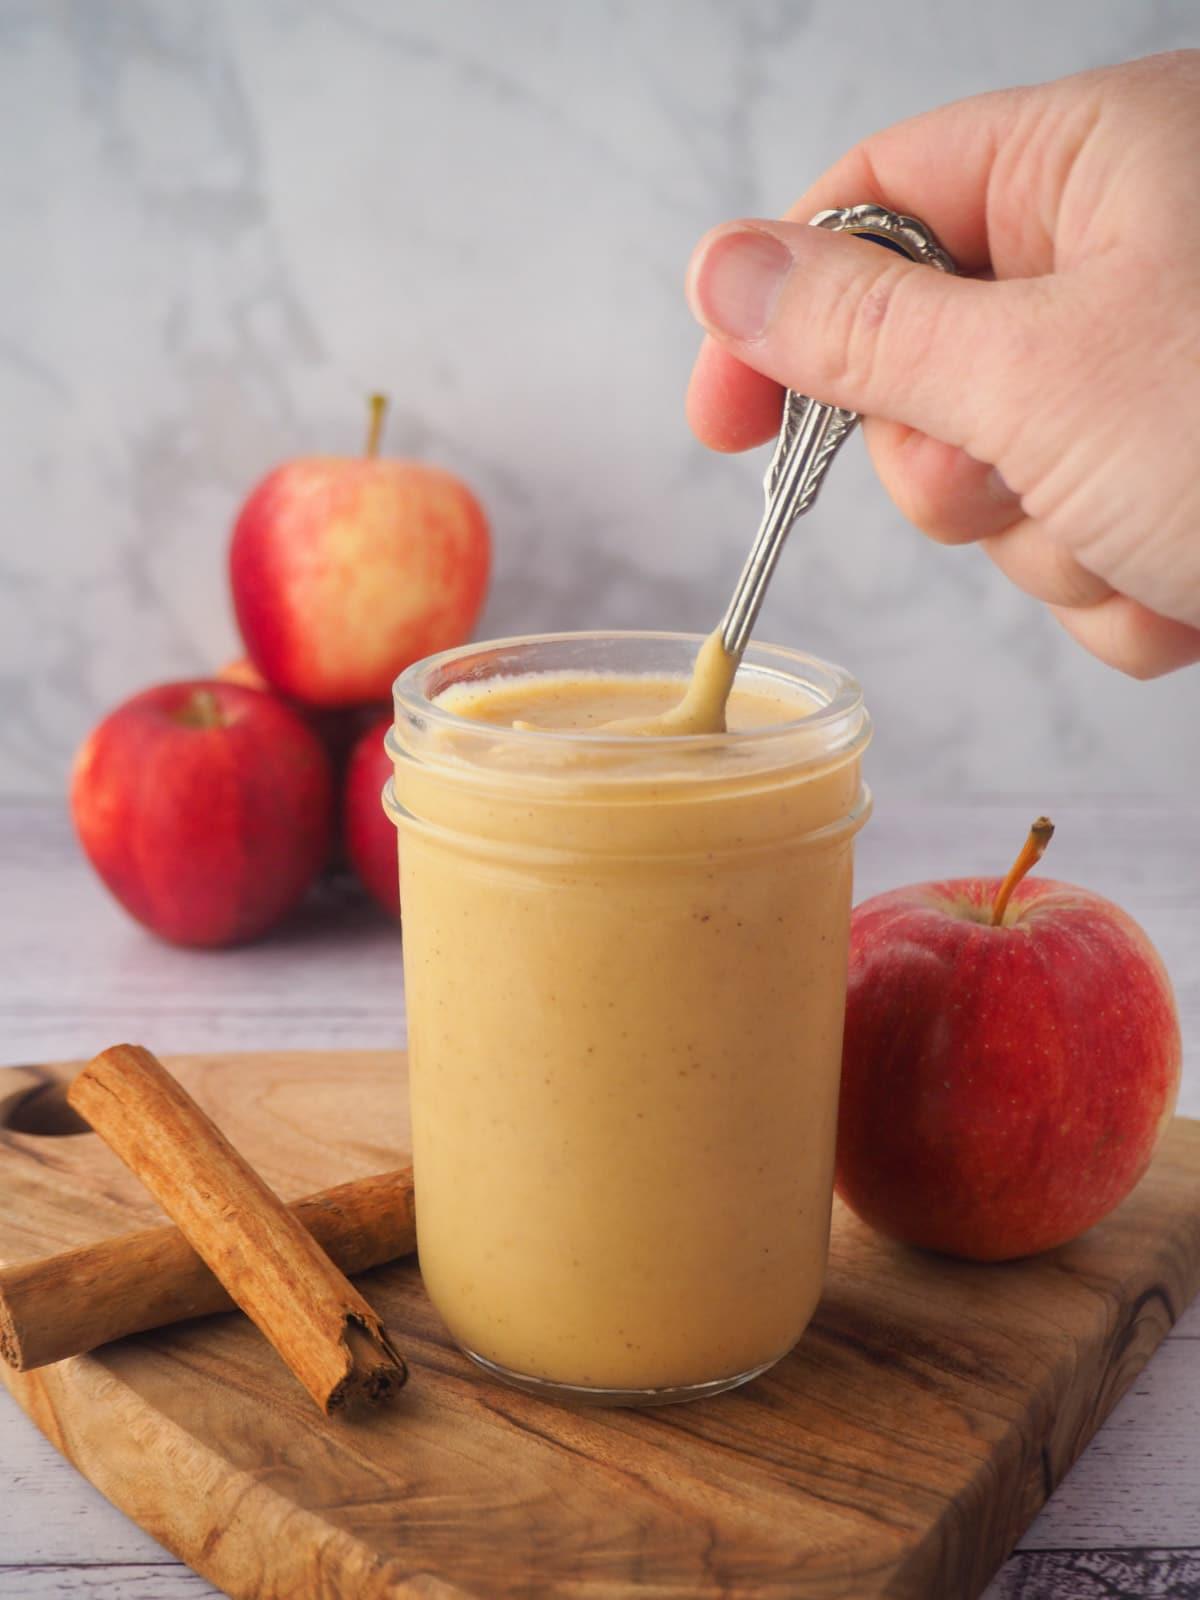 Jar of apple curd to spoon, fresh apples, cinnamon sticks